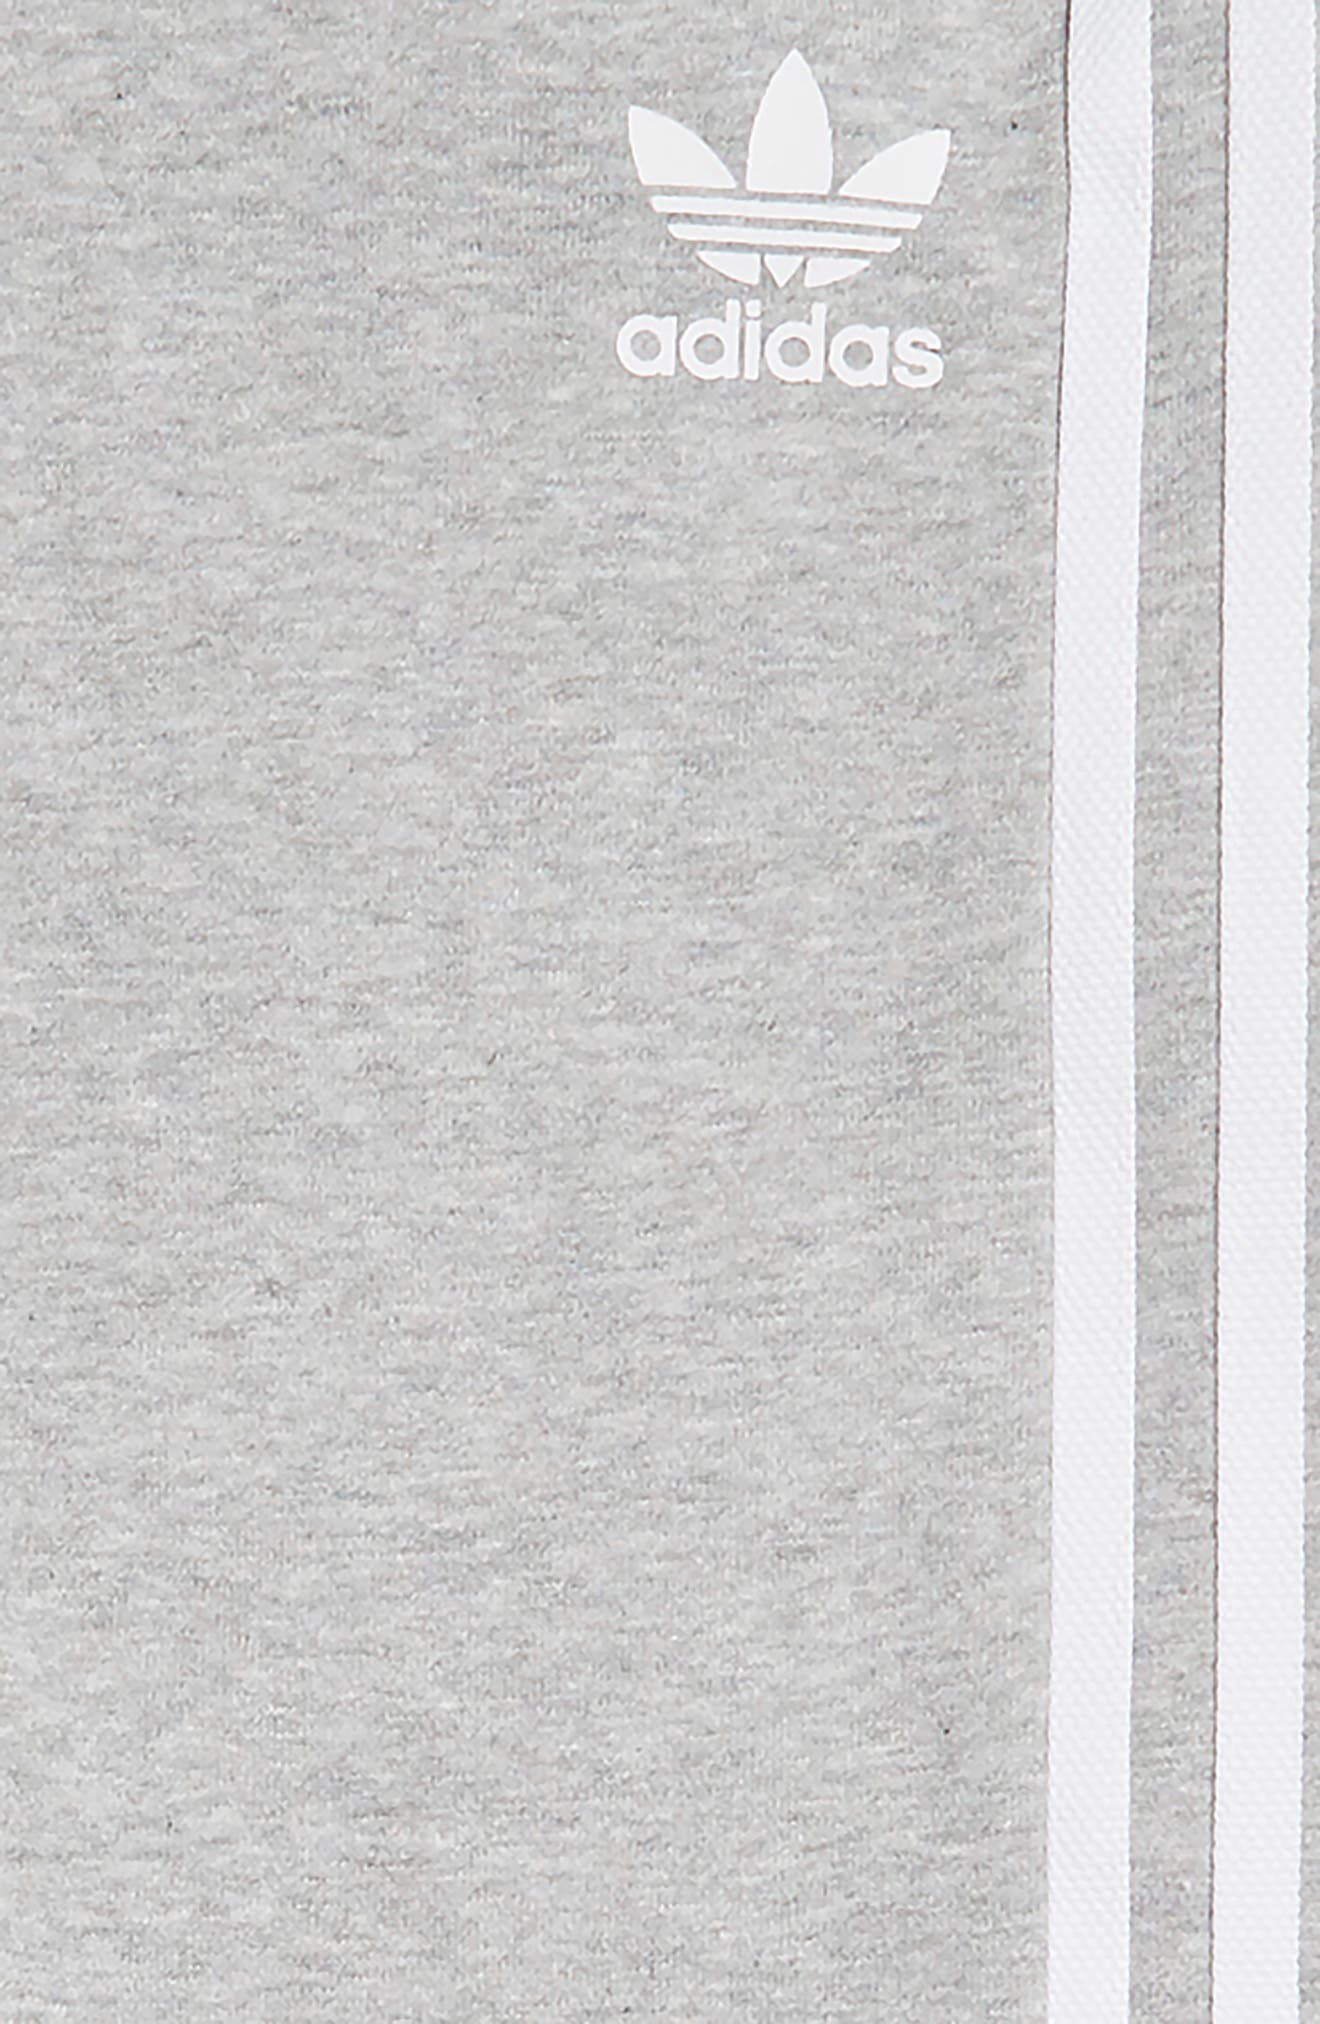 ADIDAS ORIGINALS,                             JW Sweatpants,                             Alternate thumbnail 2, color,                             035